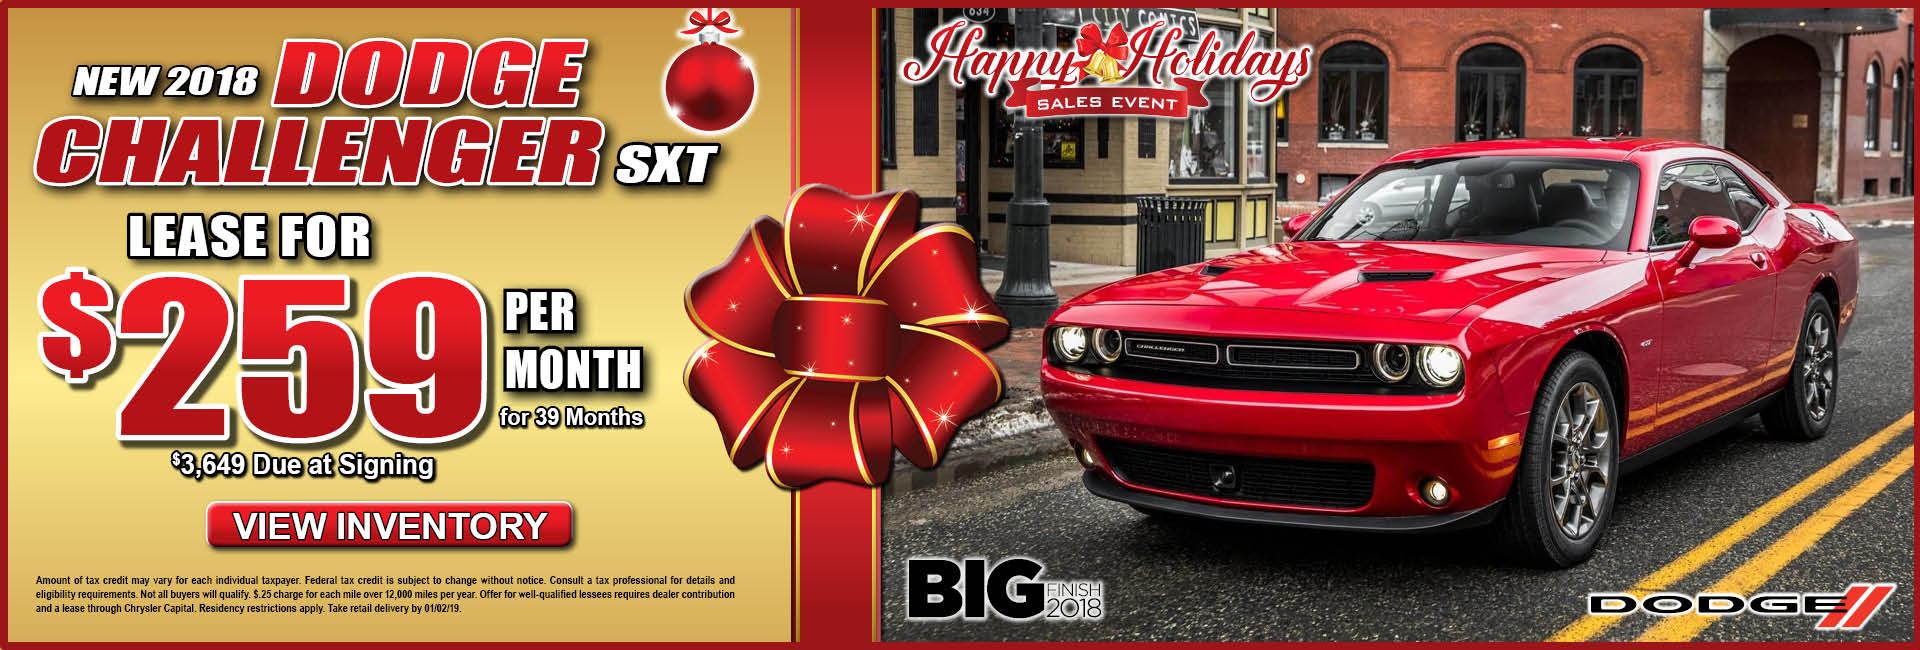 Dodge Challenger $259 Lease